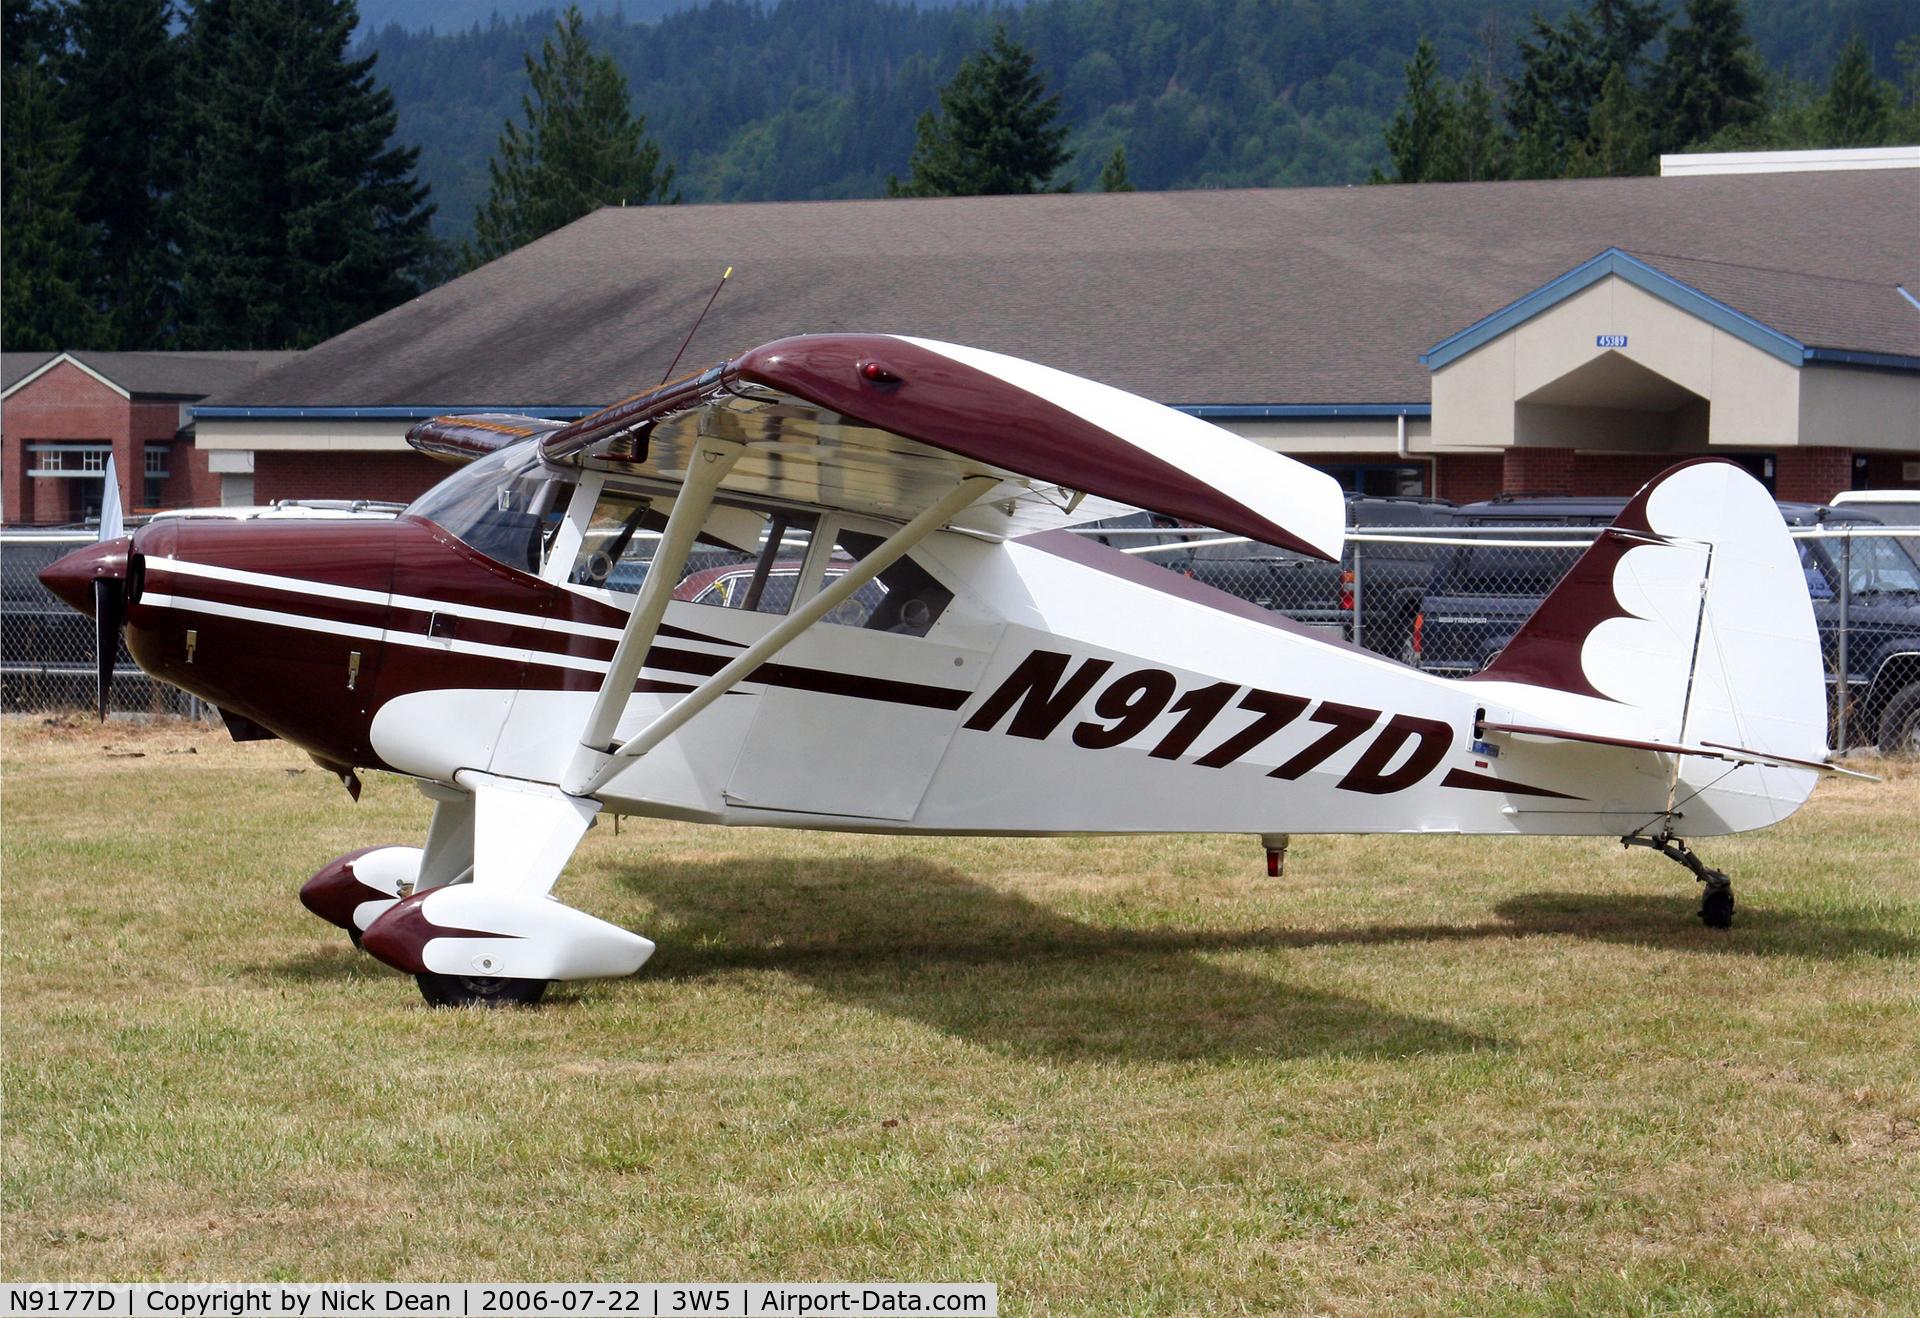 N9177D, 1958 Piper PA-22-160 Tri Pacer C/N 22-6234, .